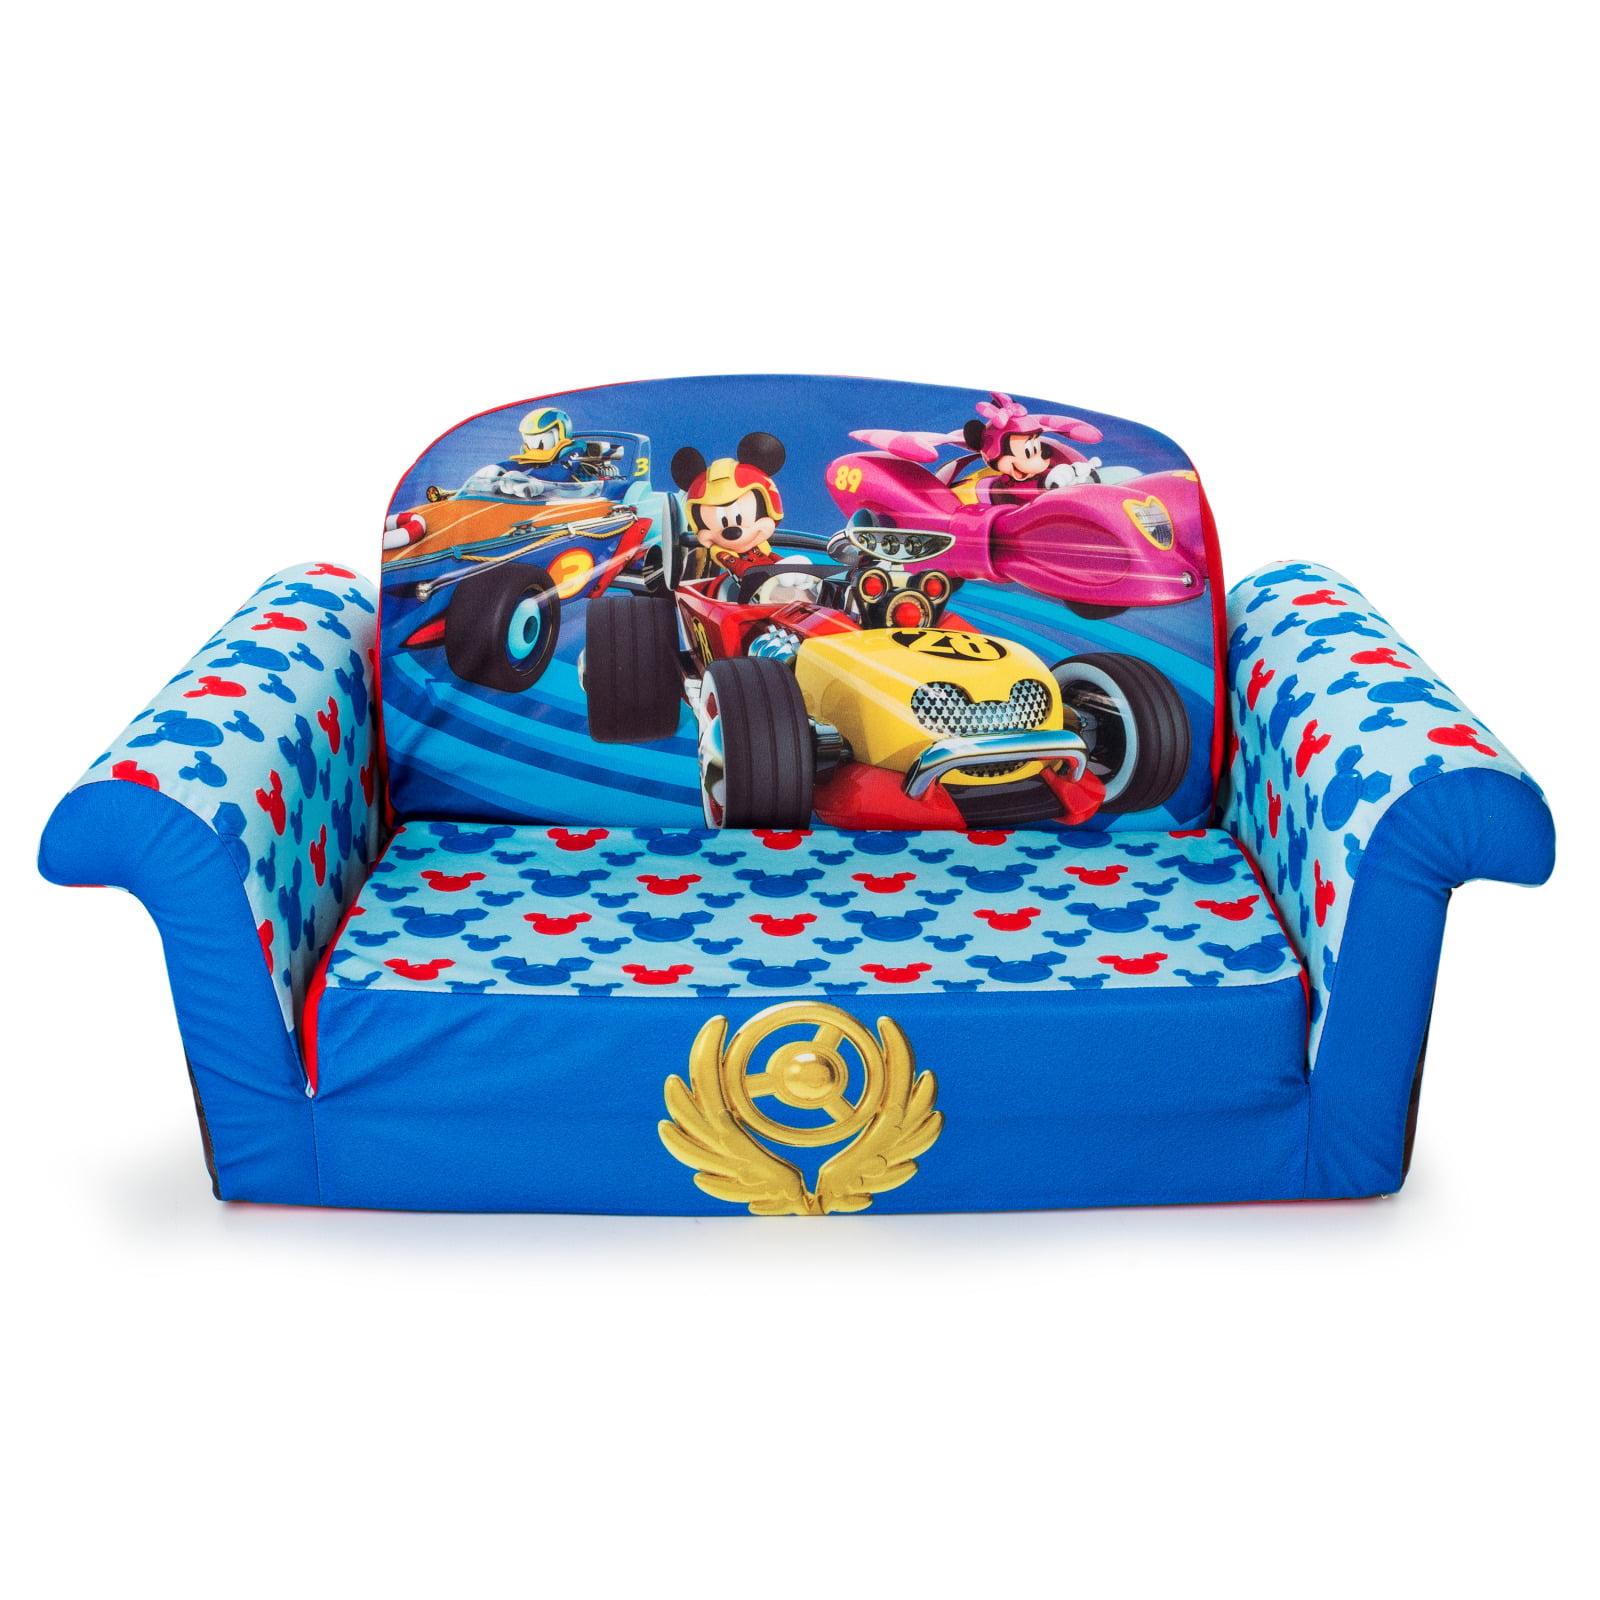 Spin Master Disney Mickey Mouse Roadsters Flip Open Foam Sofa Marshmallow Furniture